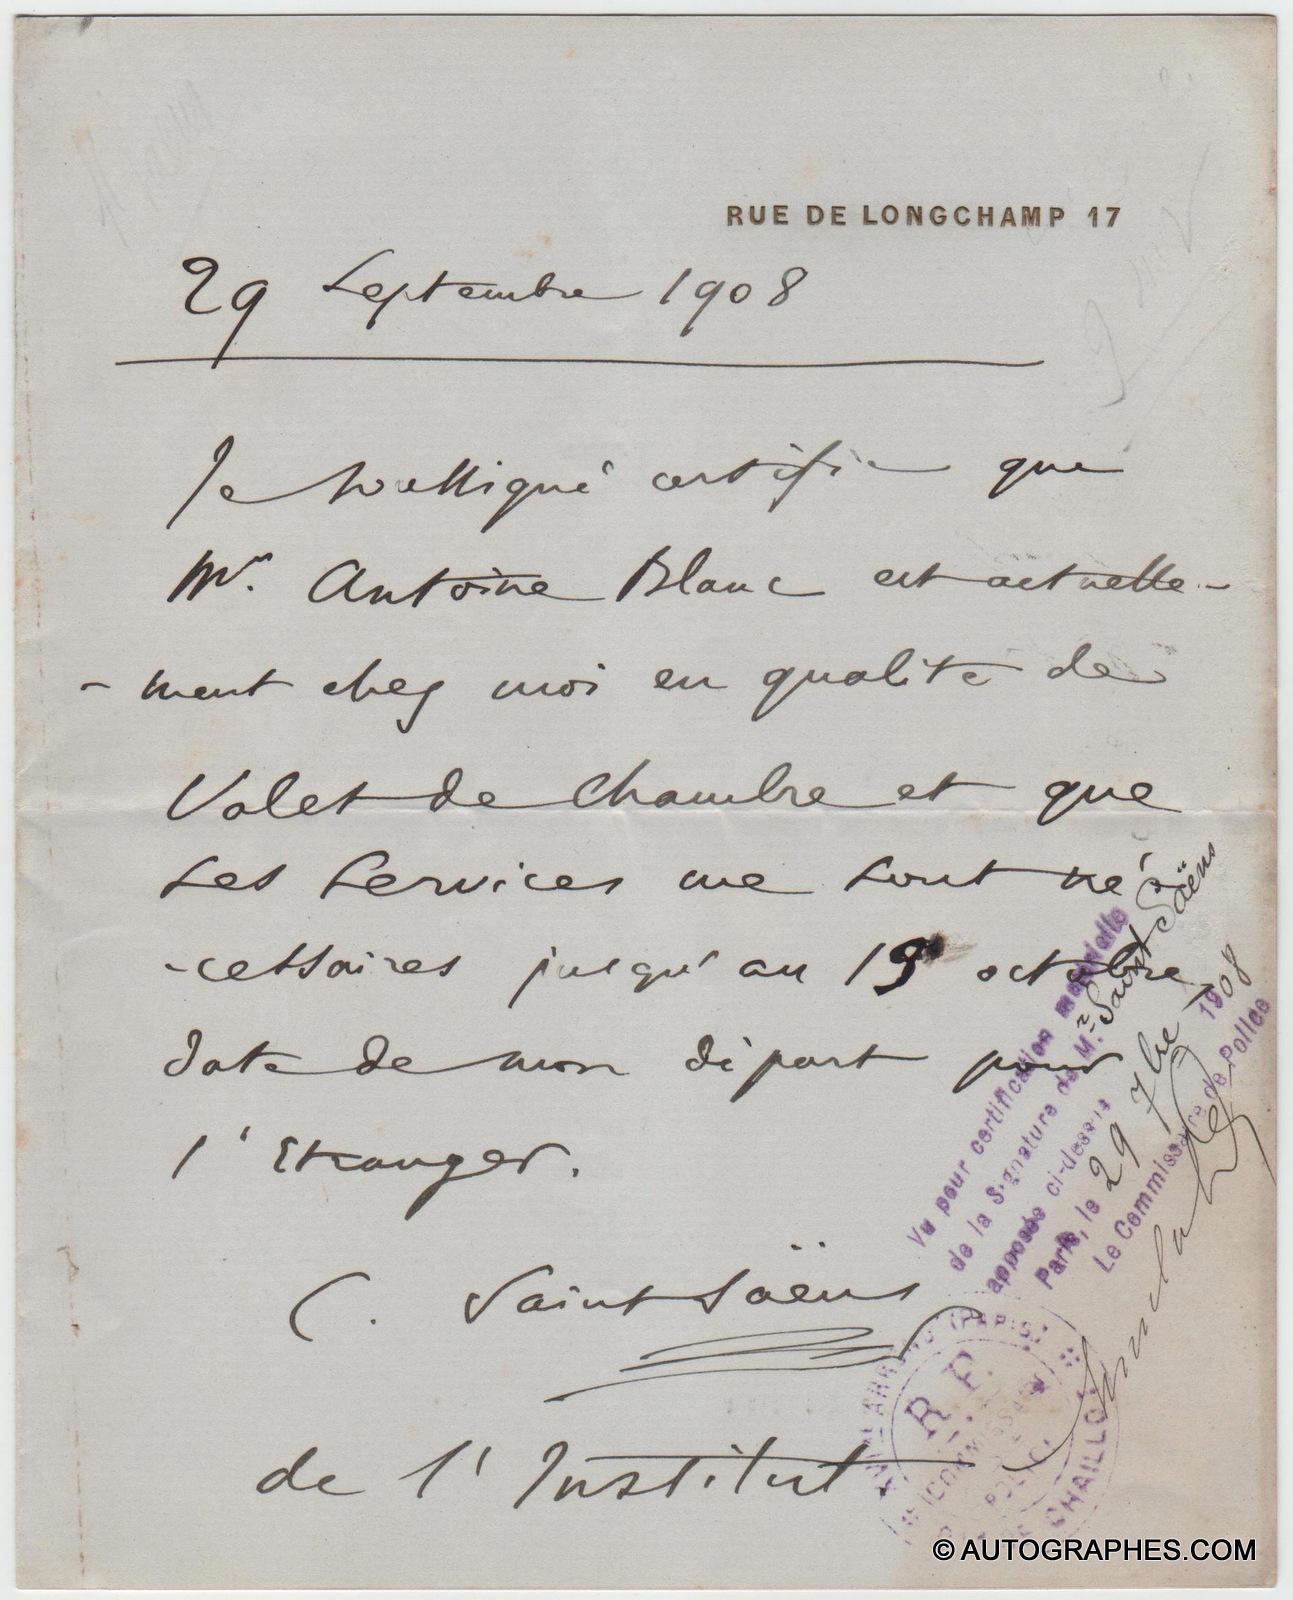 Camille SAINT-SAËNS - Document autographe signé